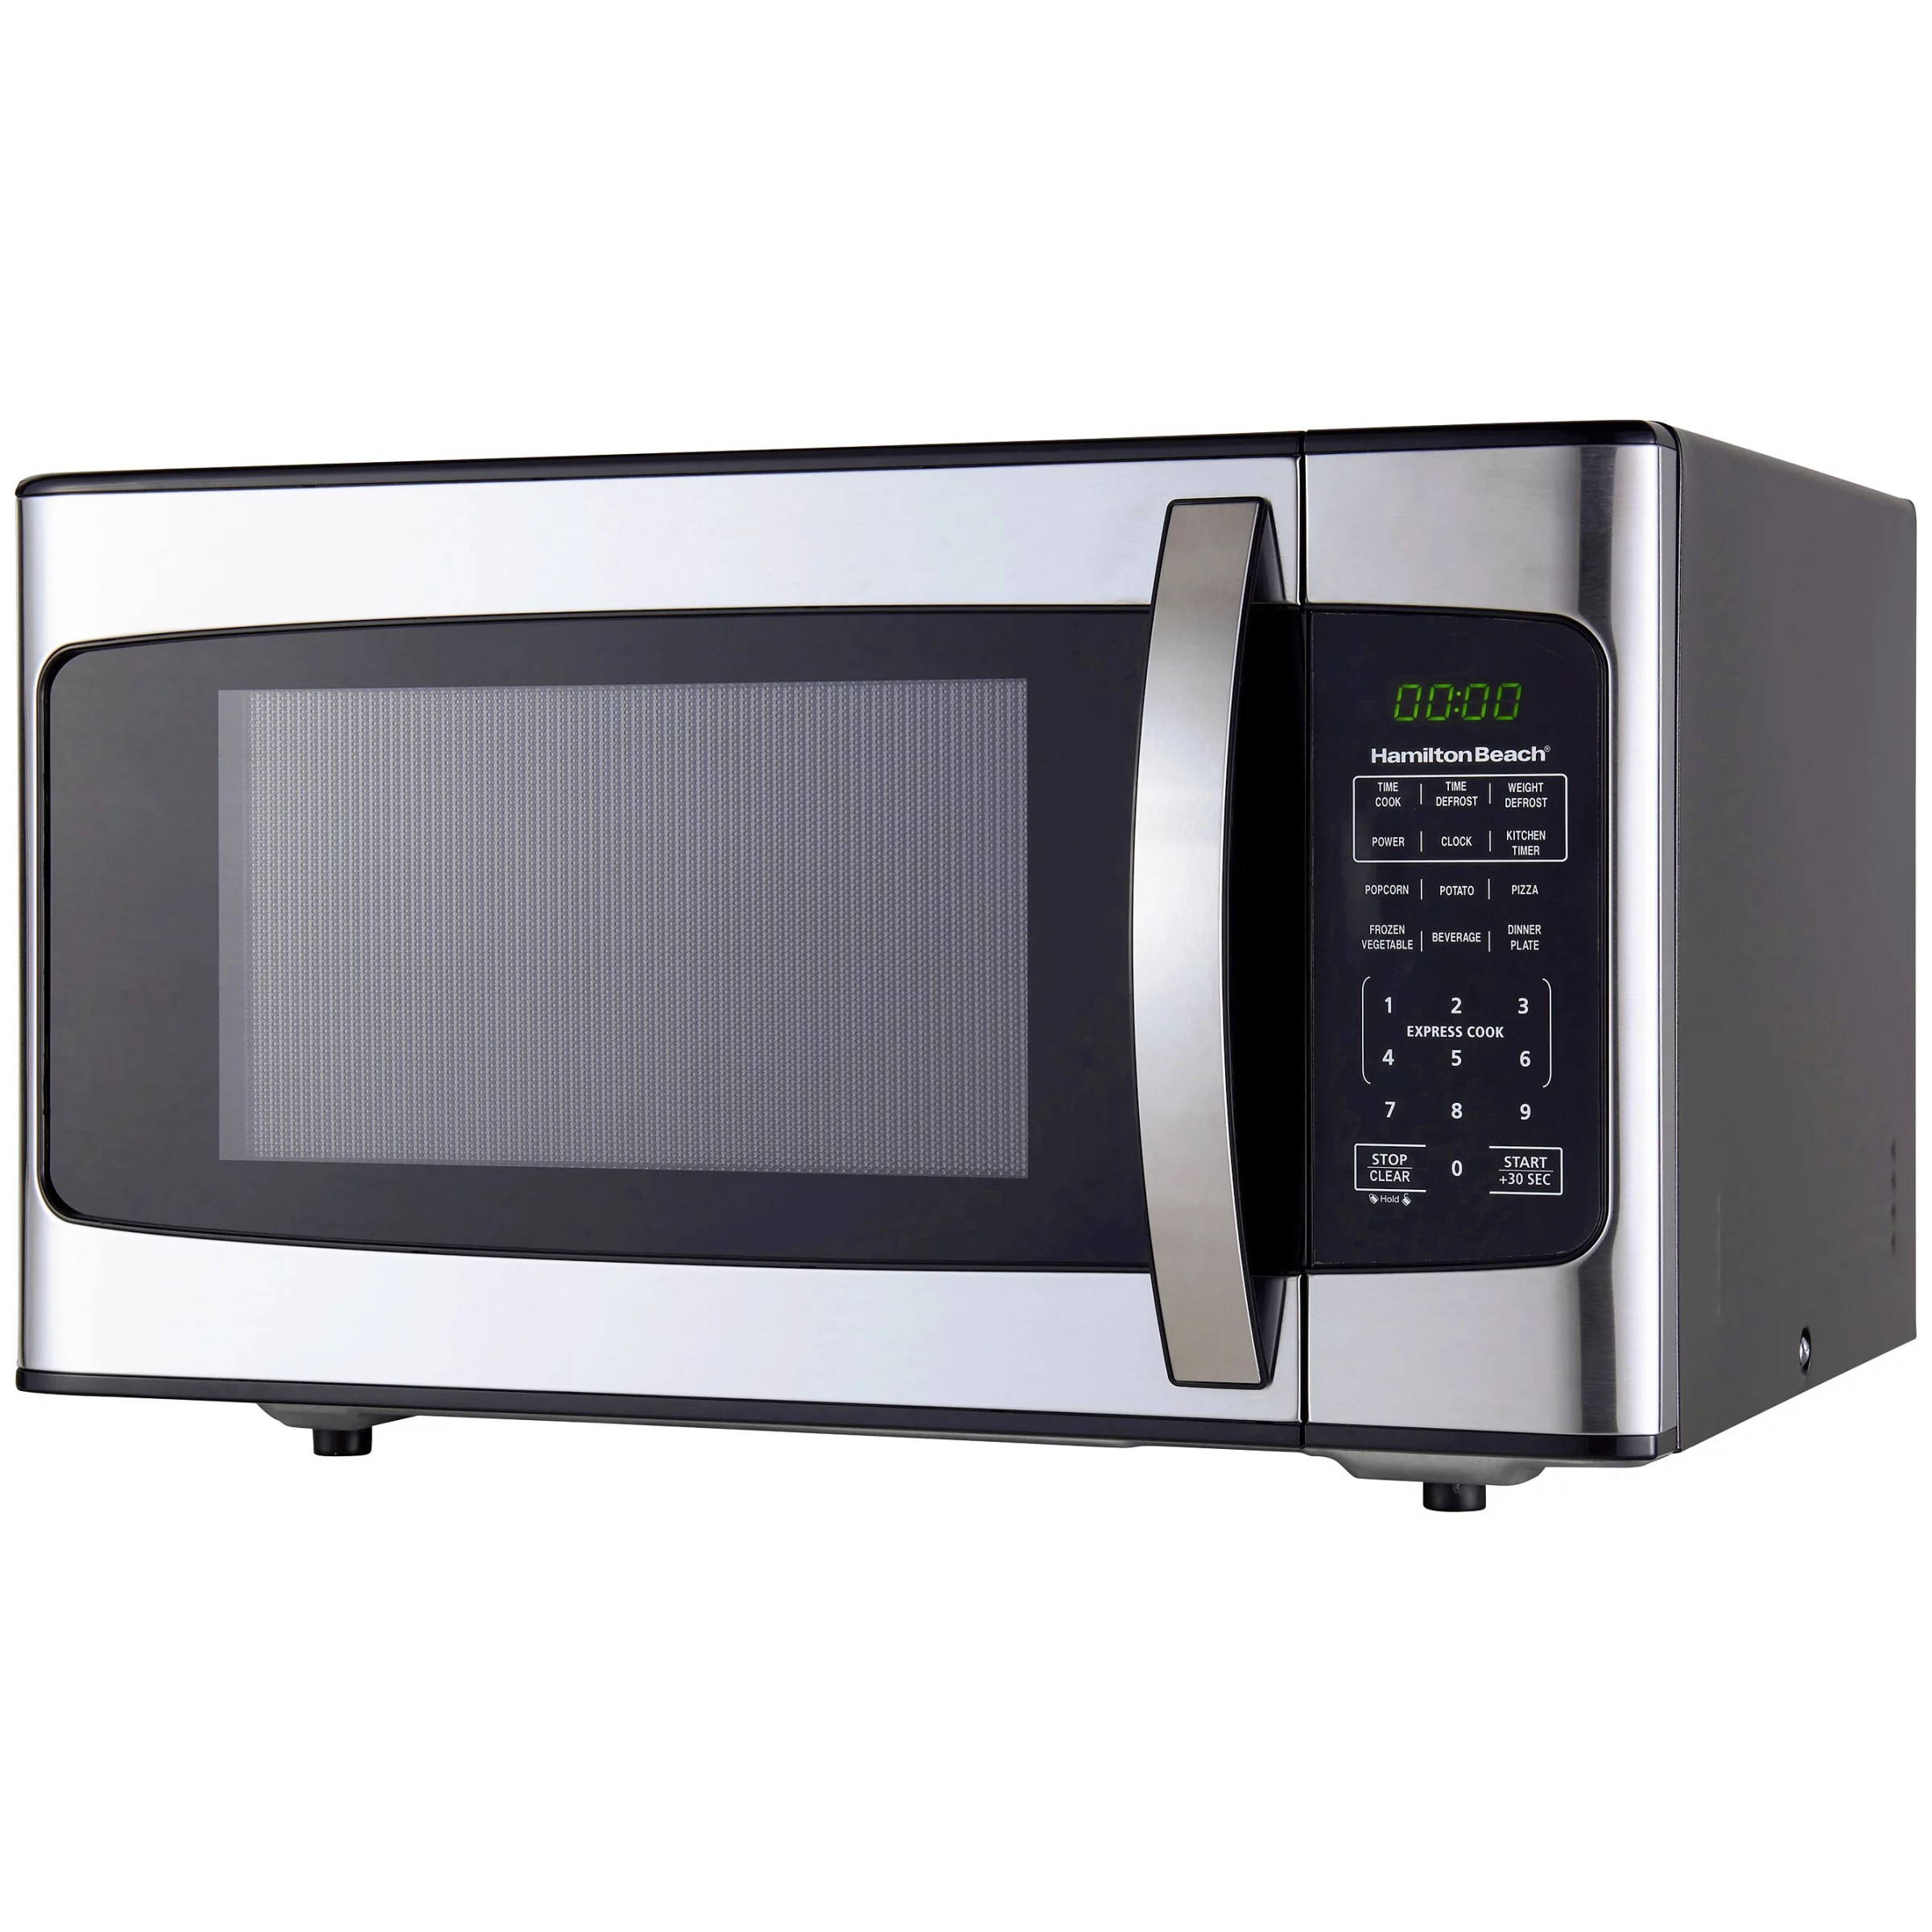 hamilton beach 1 1 cu ft 1000w stainless steel microwave walmart com